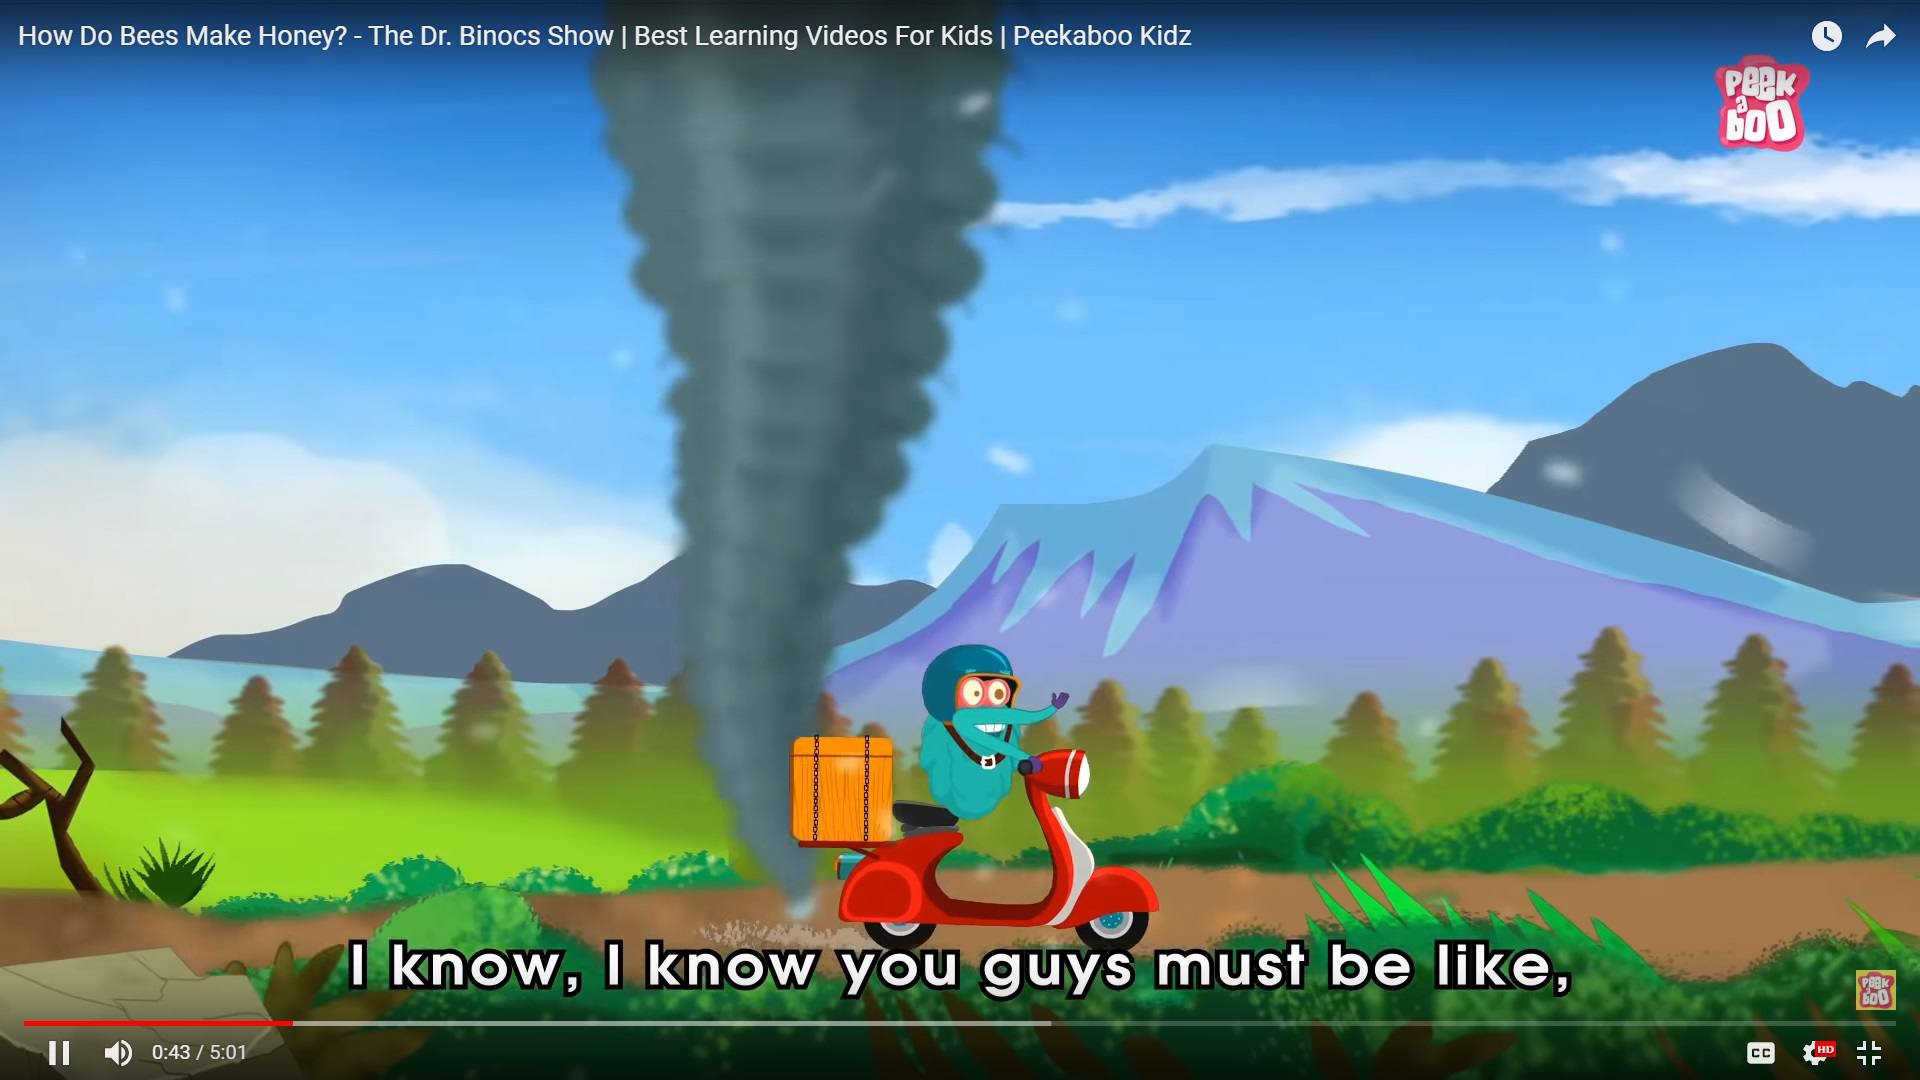 Dr. Binocs screenshot with Dr. Bionics riding a vespa in front of a cartoon tornado